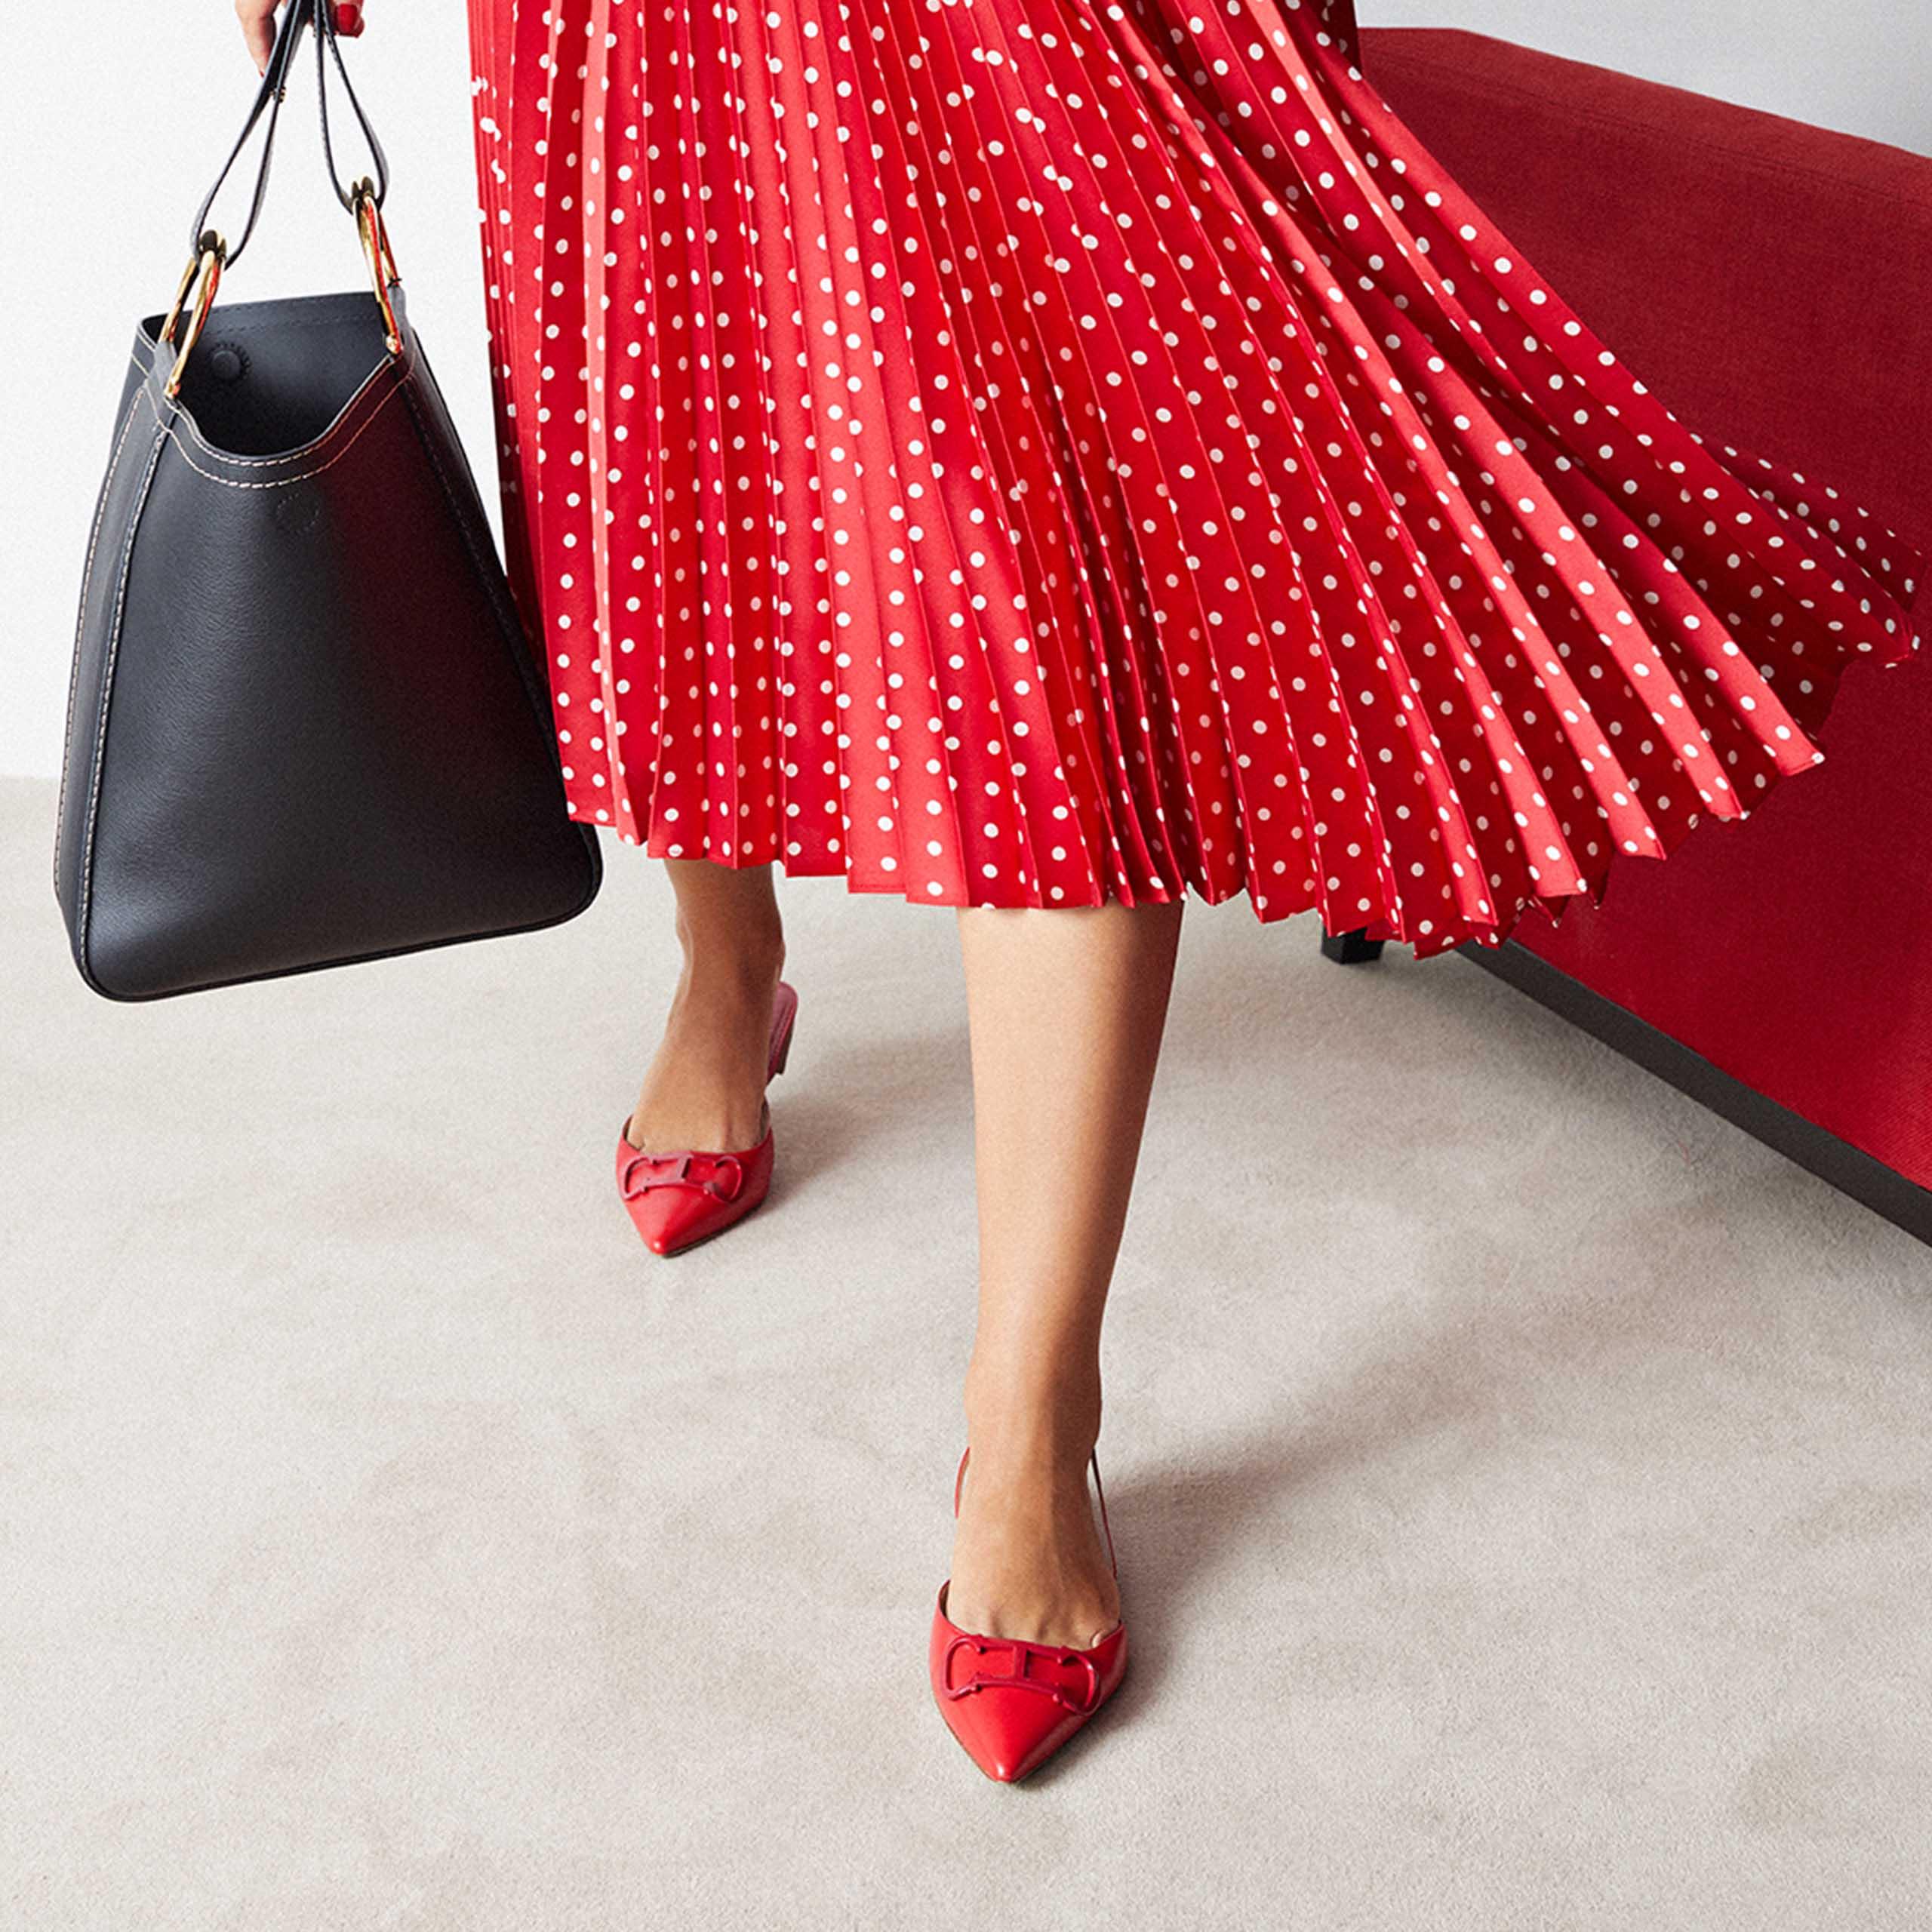 carolina herrera shoes online store